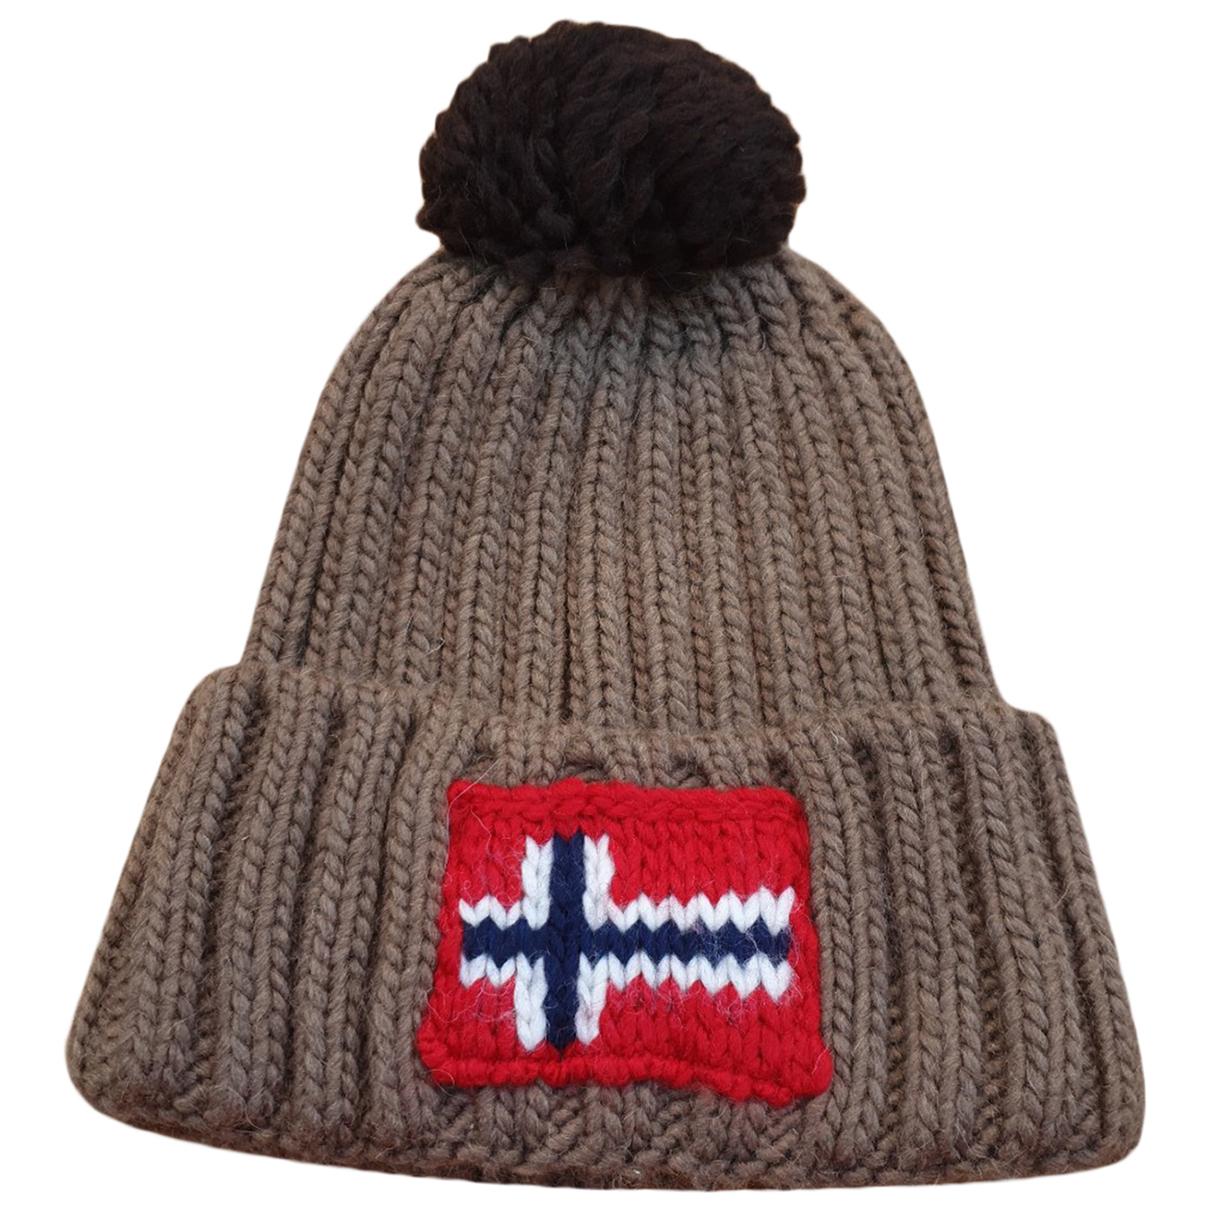 Napapijri \N Hut, Muetzen, Handschuhe in  Beige Wolle